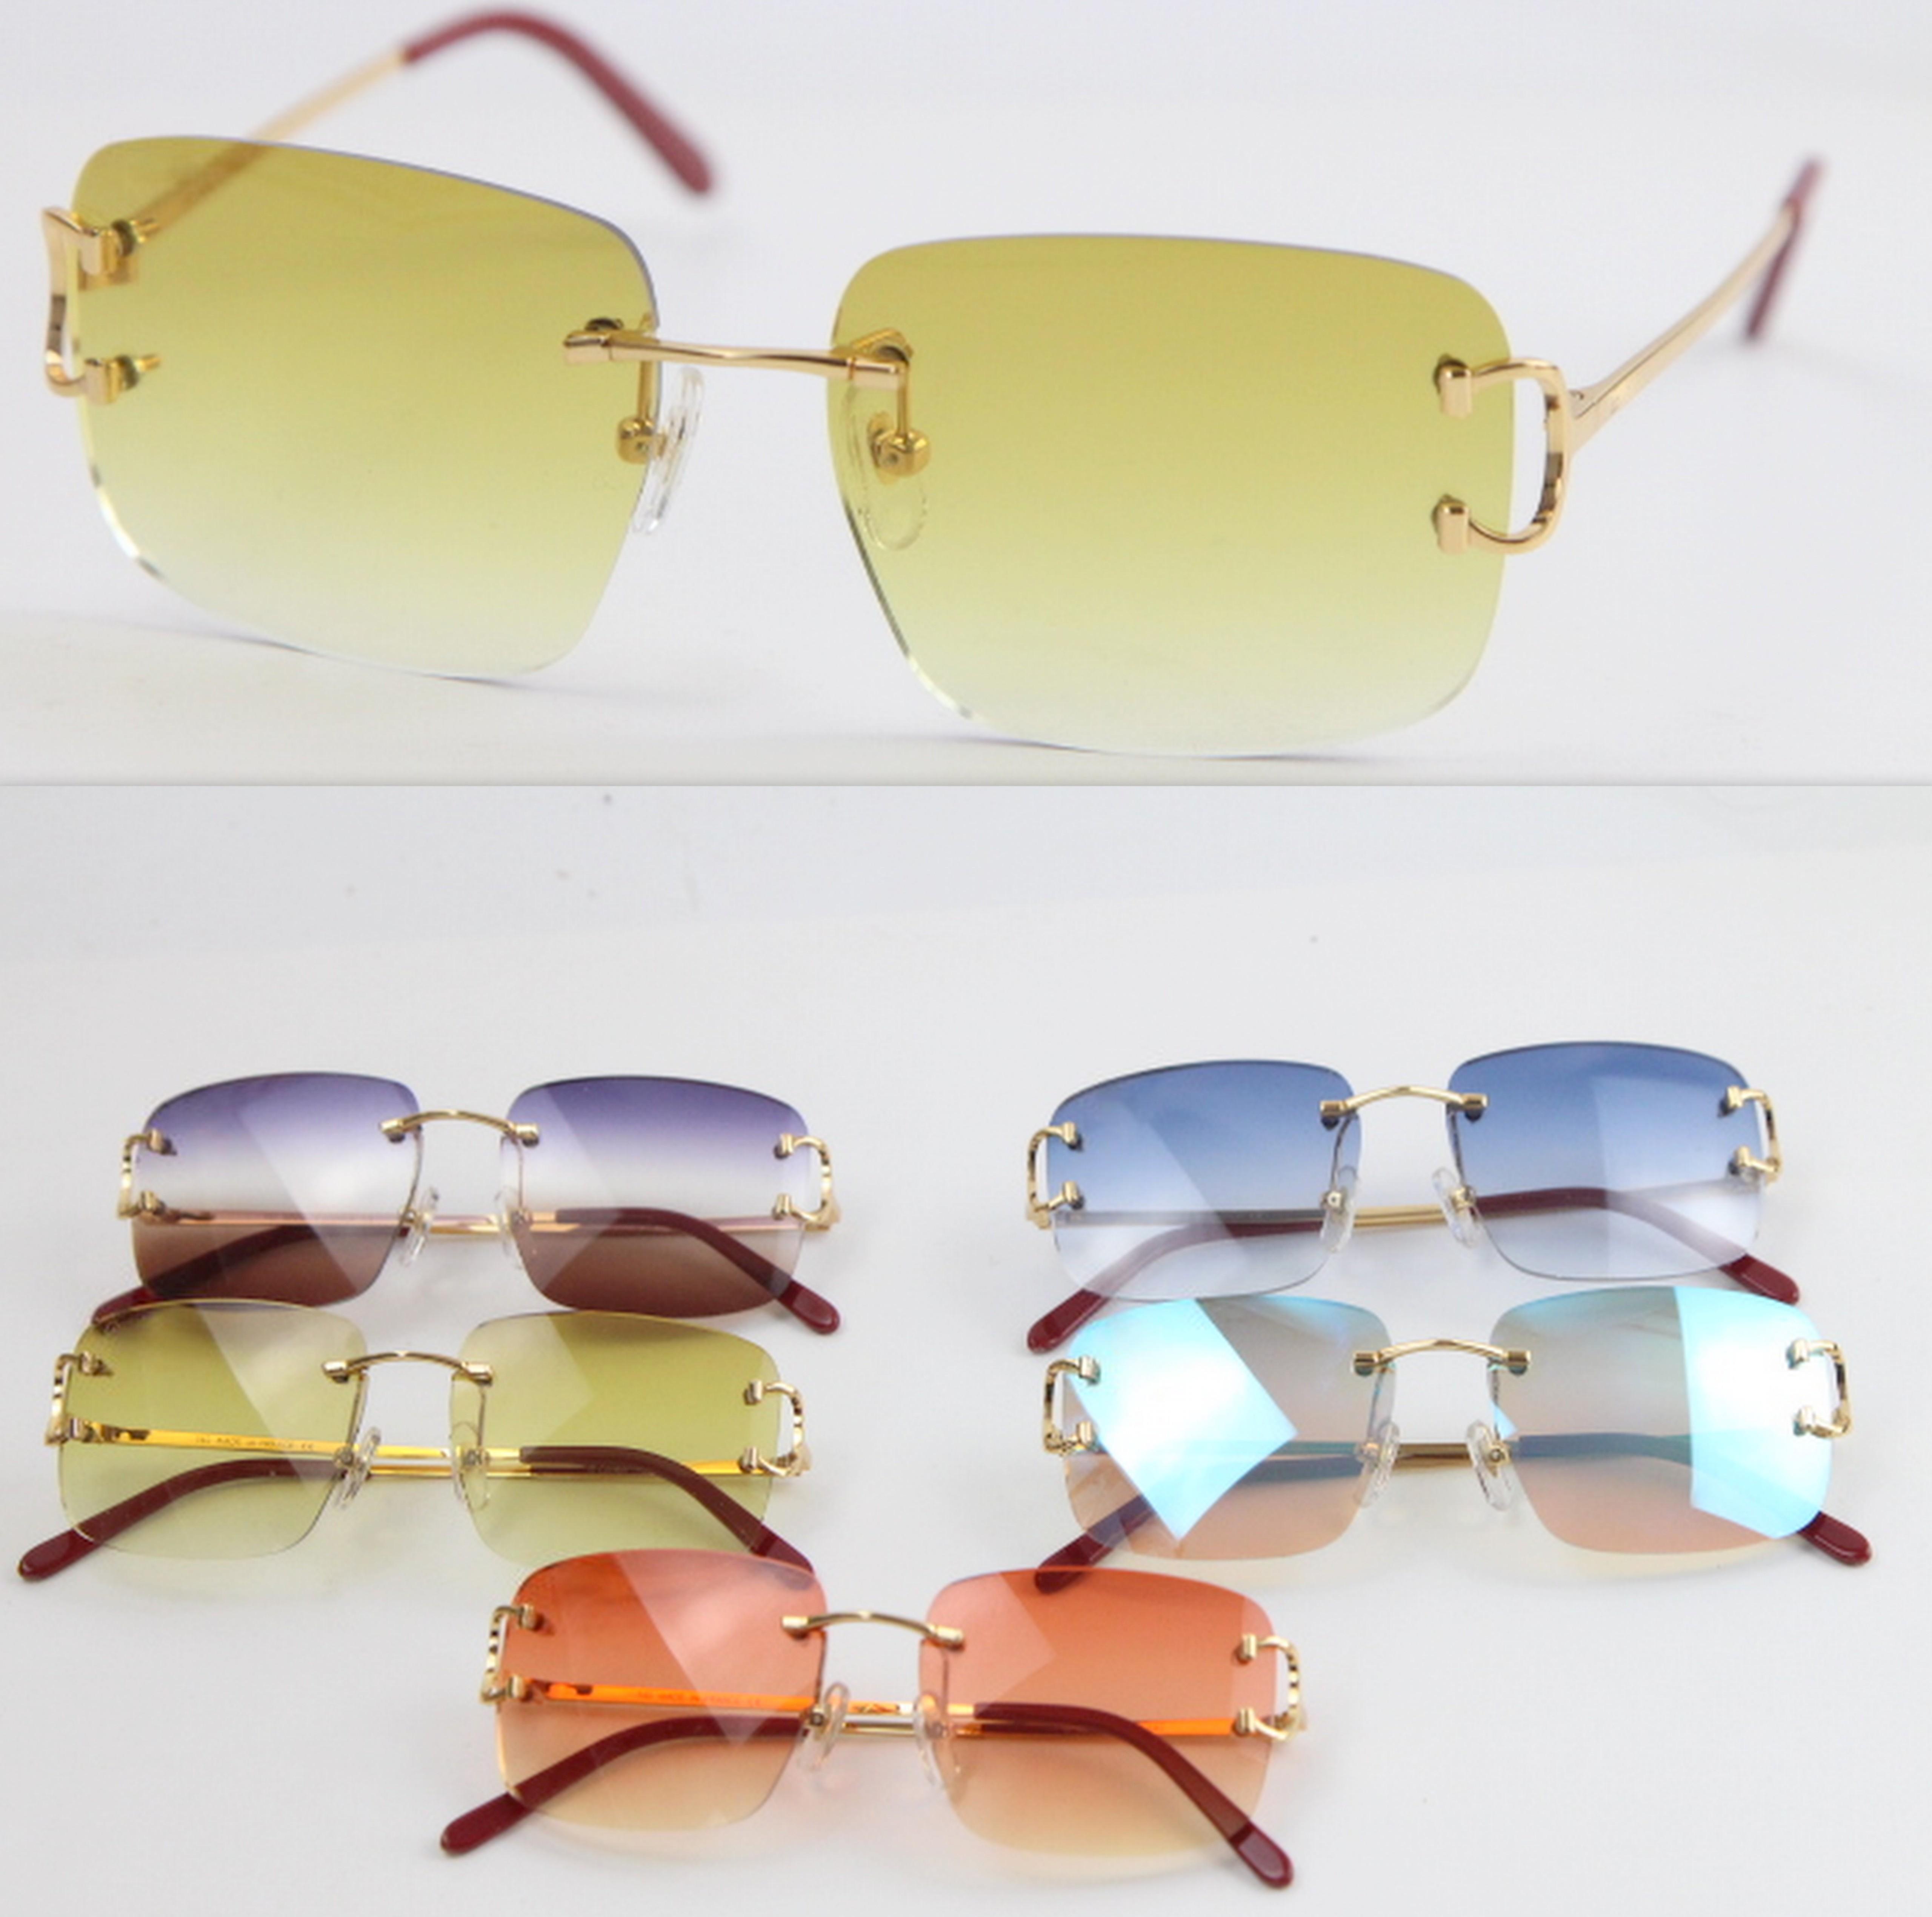 2020 popular new style rimless sunglasses hot t8200816 delicate unisex fashion glasses metal sun glasses driving glasses c decoration